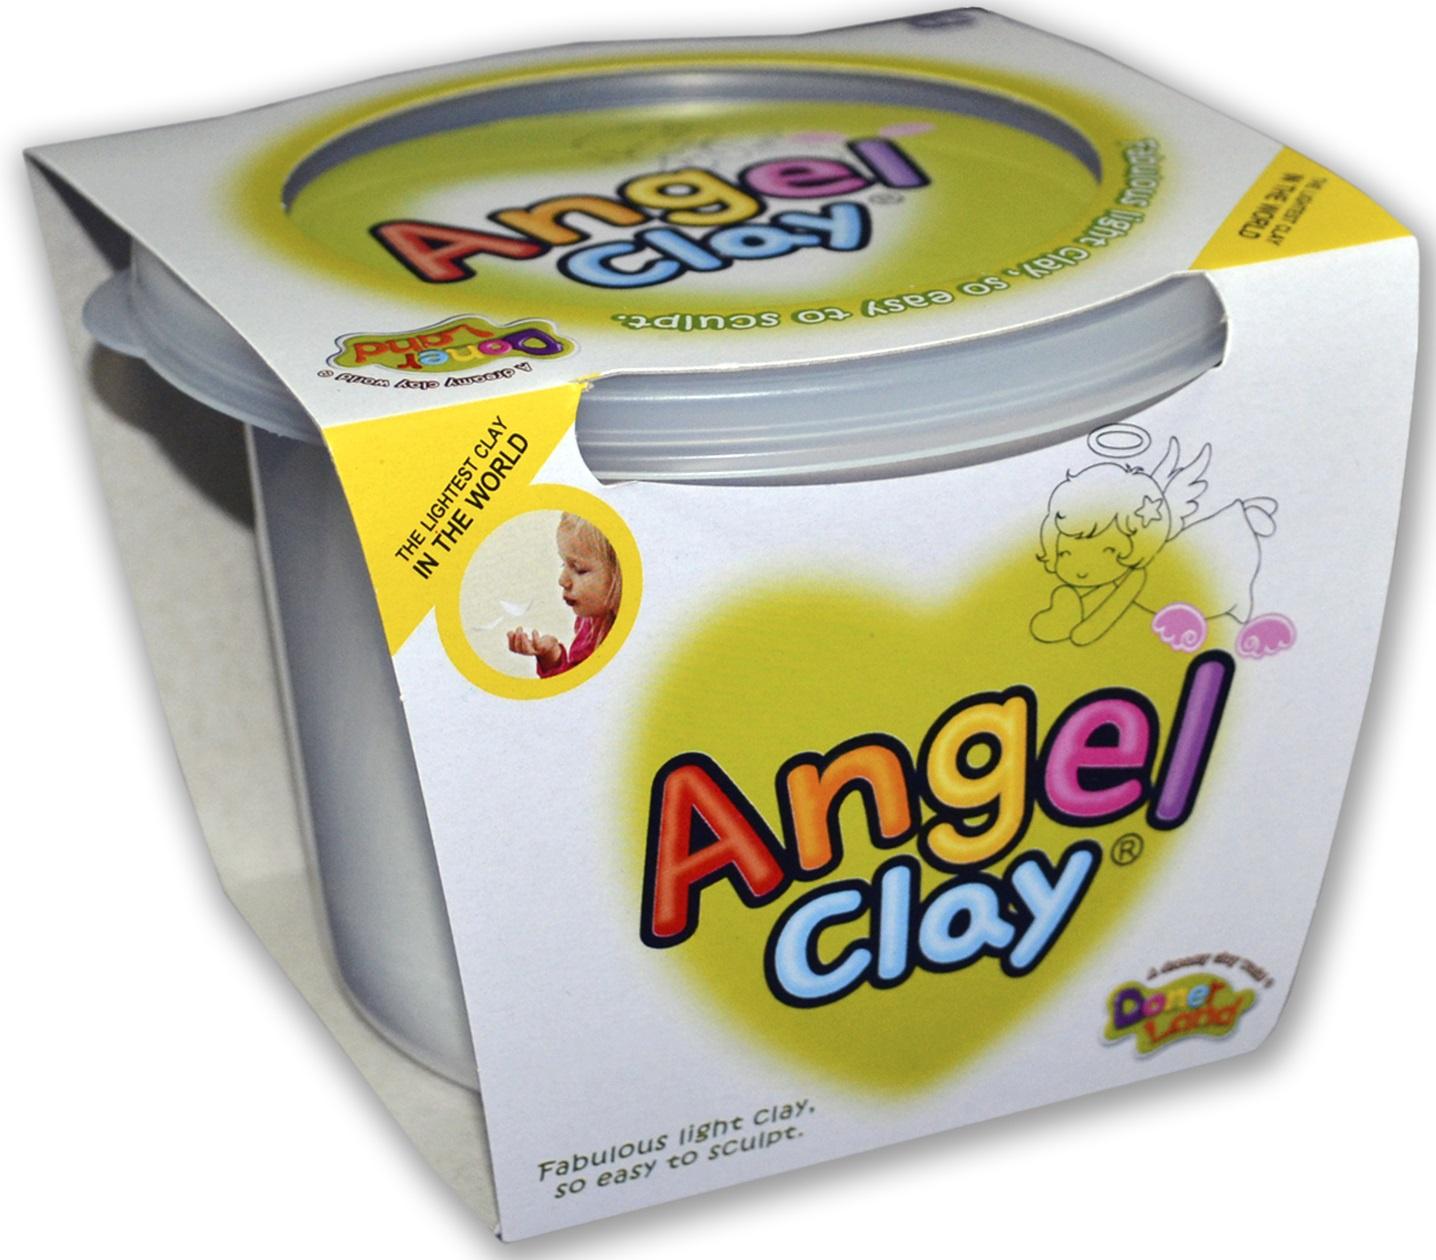 наборы для лепки angel clay набор для лепки angel clay шоколадная мастерская на русском языке Масса для лепки Angel Clay Мягкий пластилин 130 гр